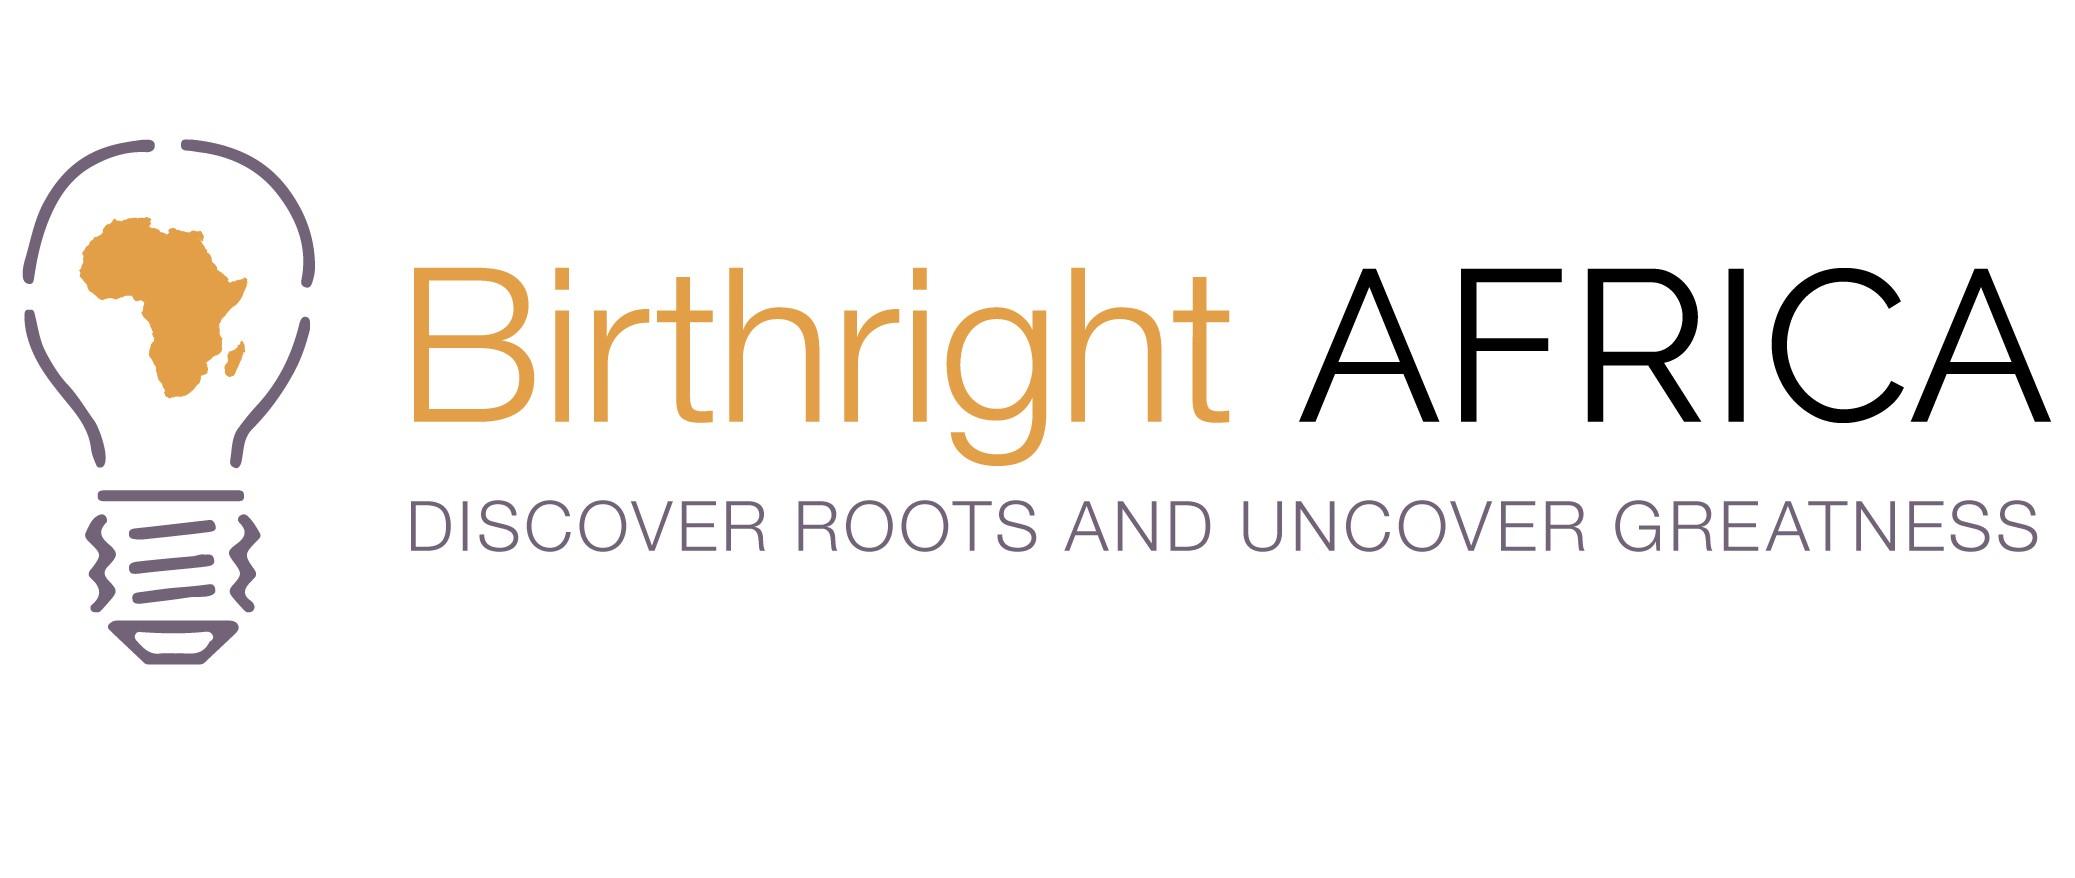 Birthright AFRICA